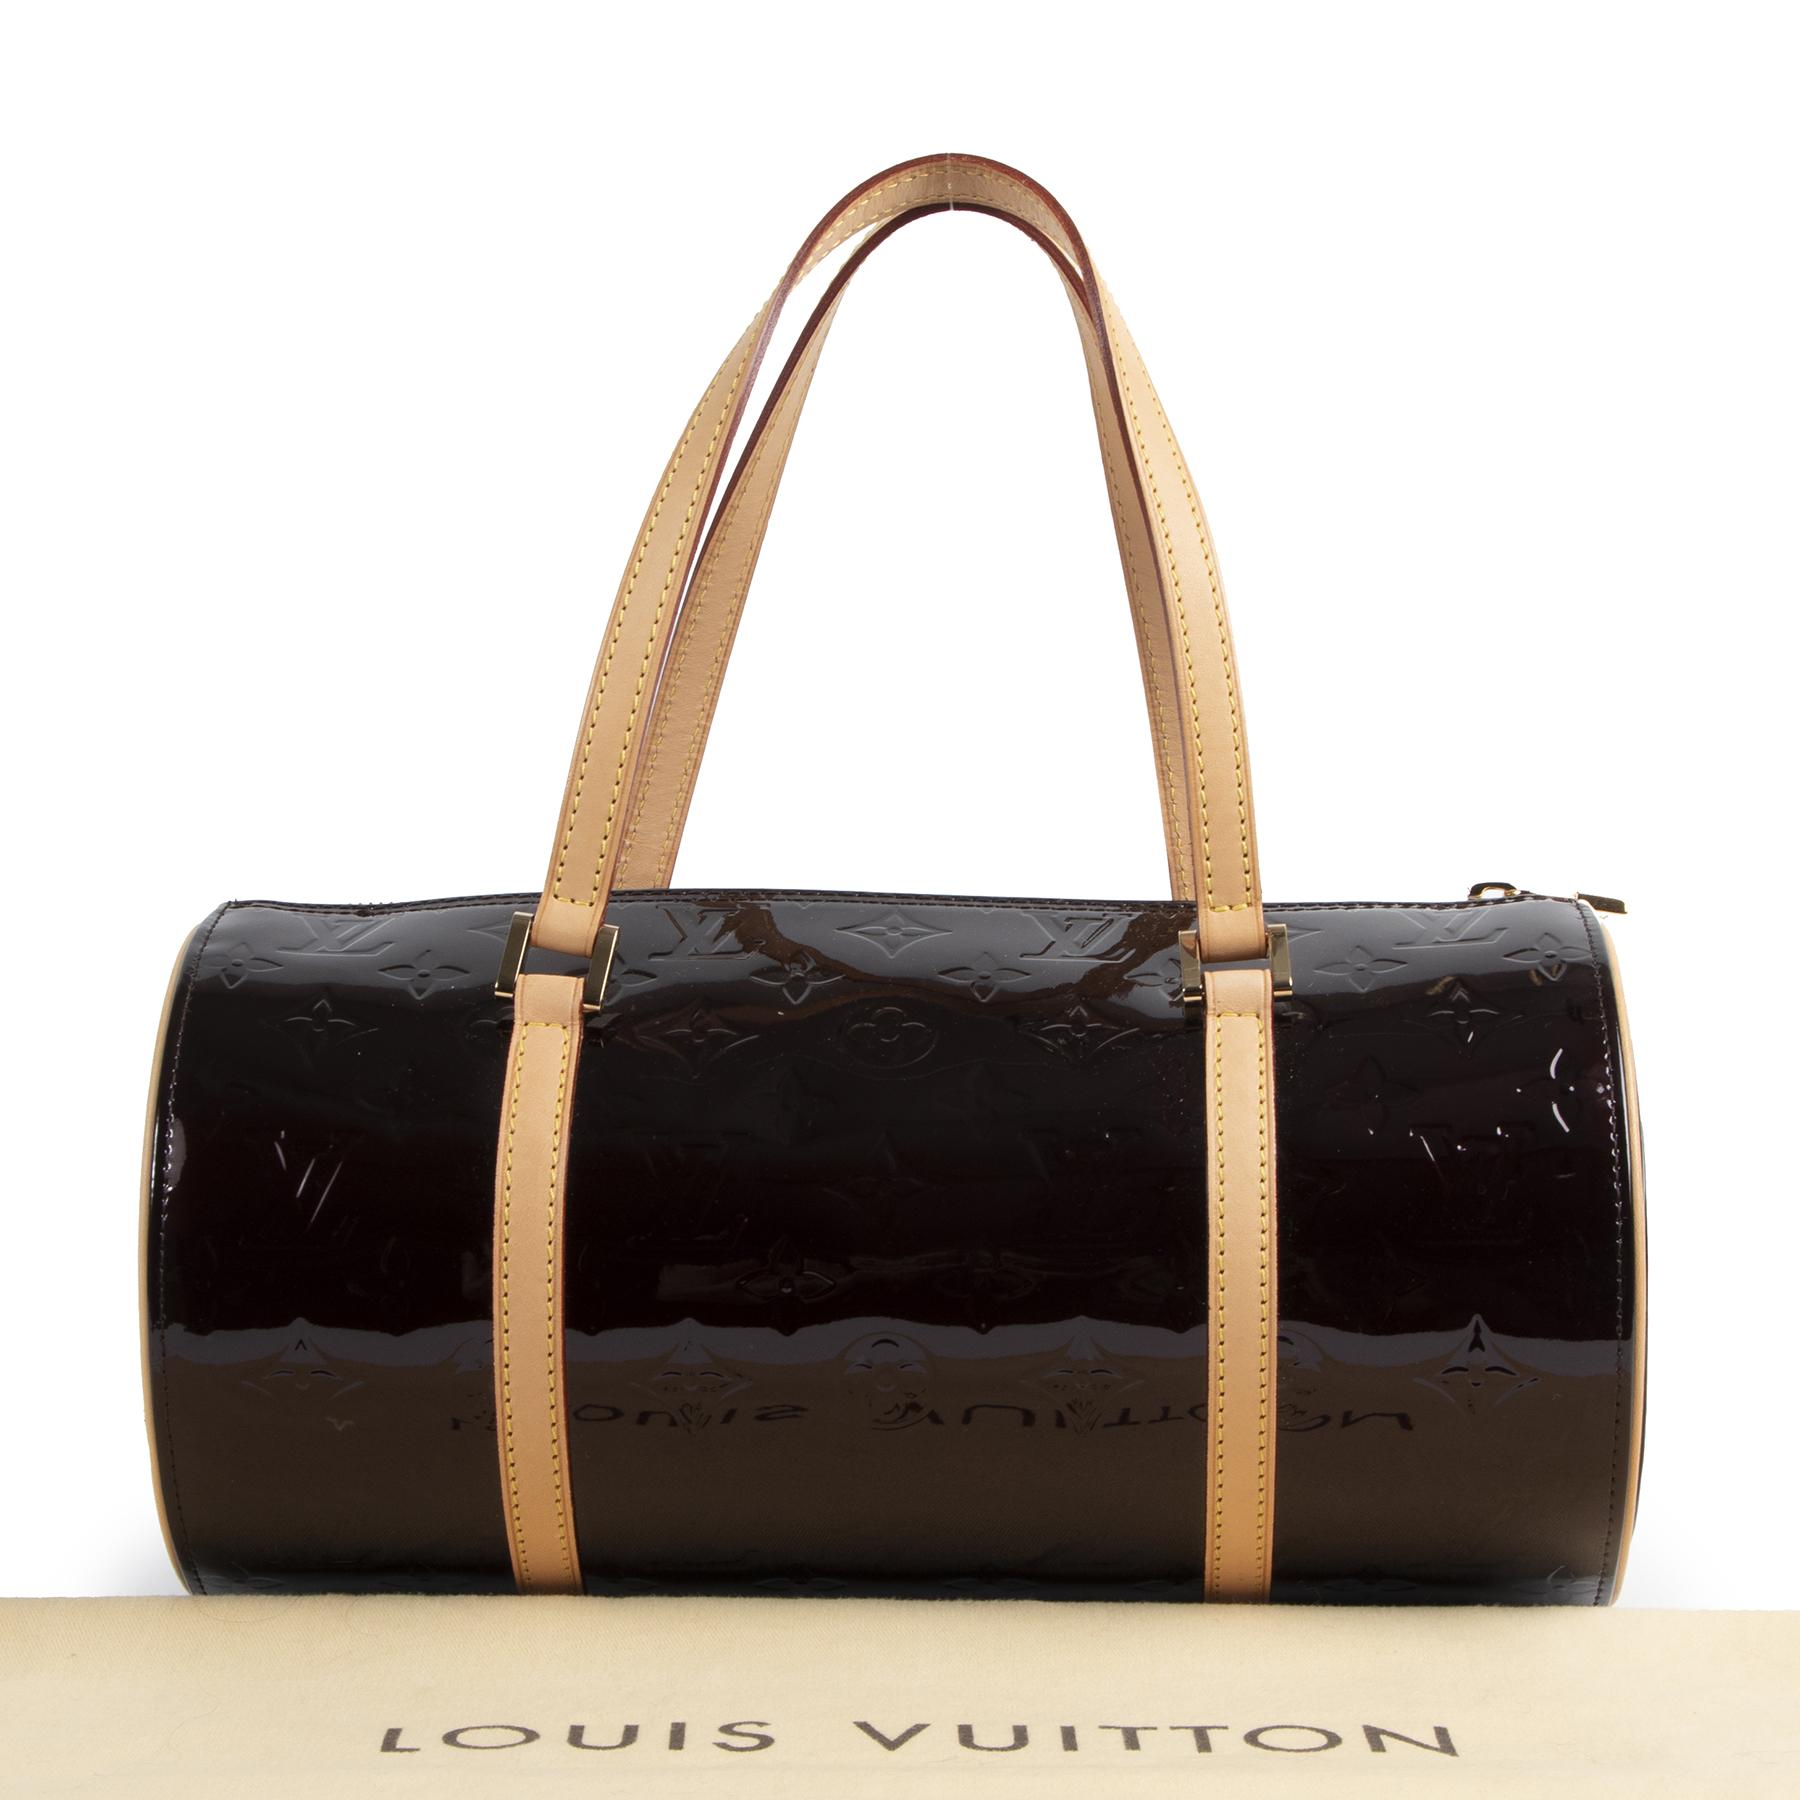 Louis Vuitton Burgundy Patent Leather Bedford Bag